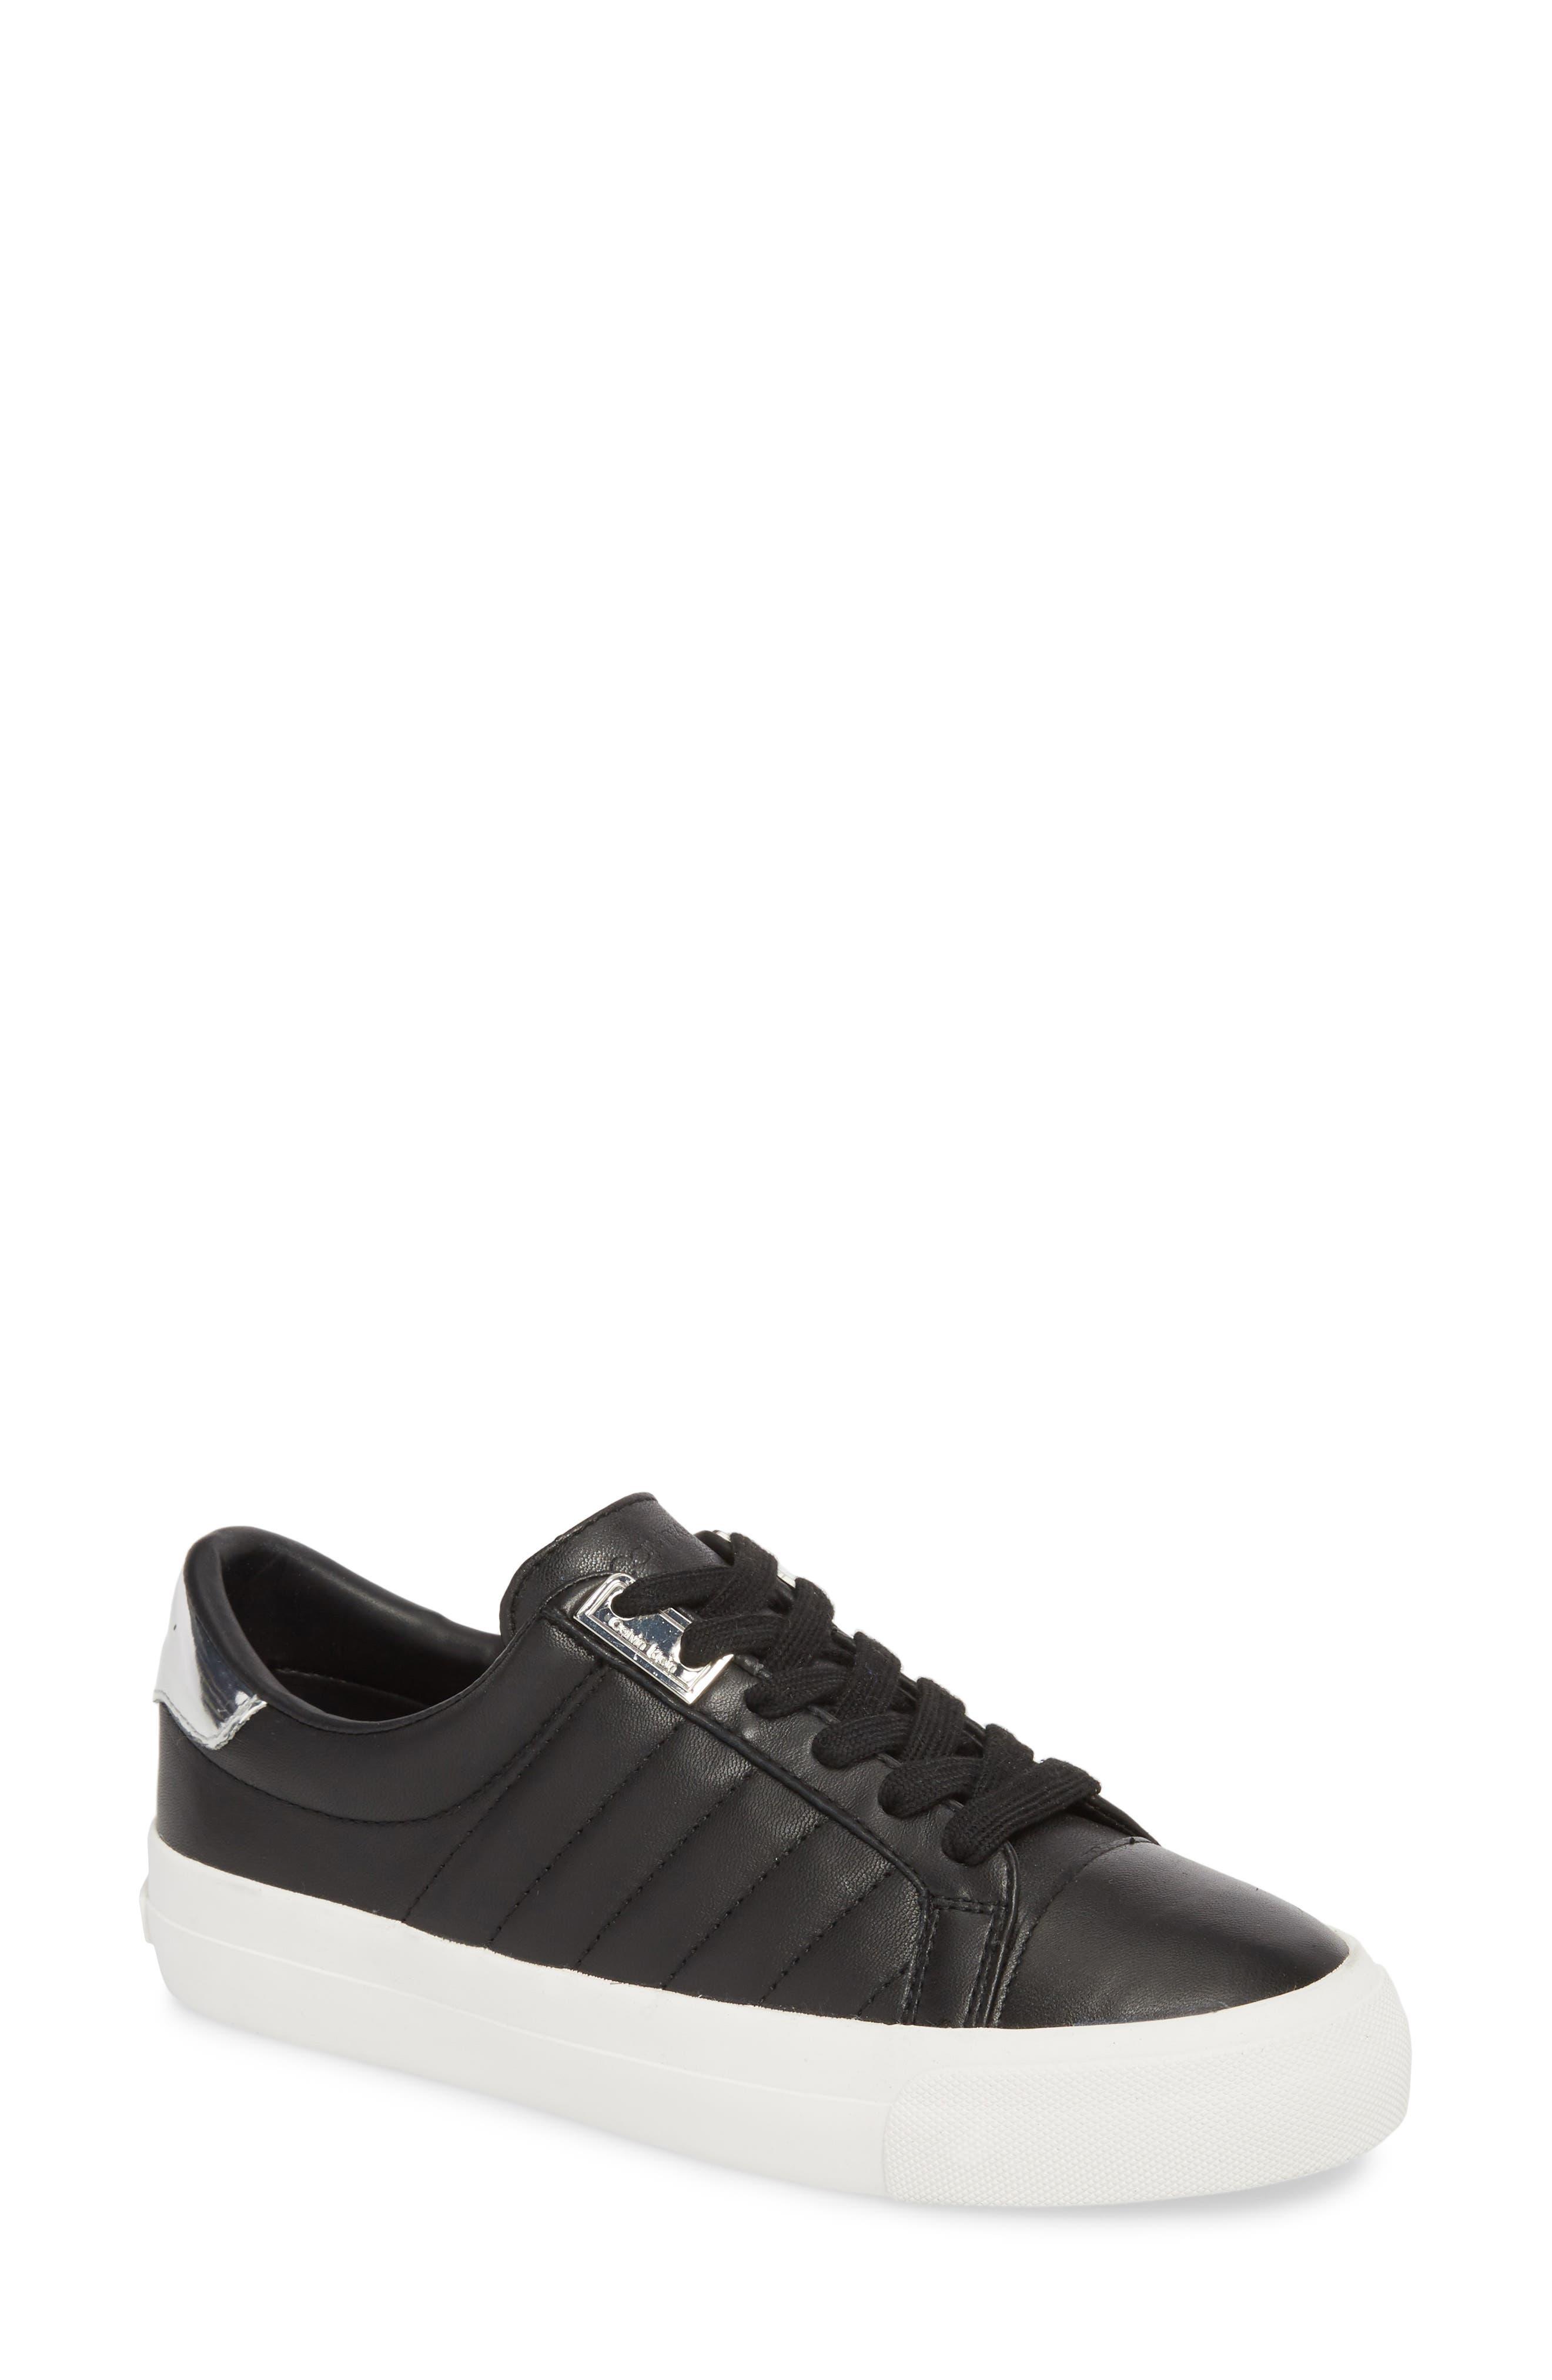 Vance Sneaker,                             Main thumbnail 1, color,                             Black Leather